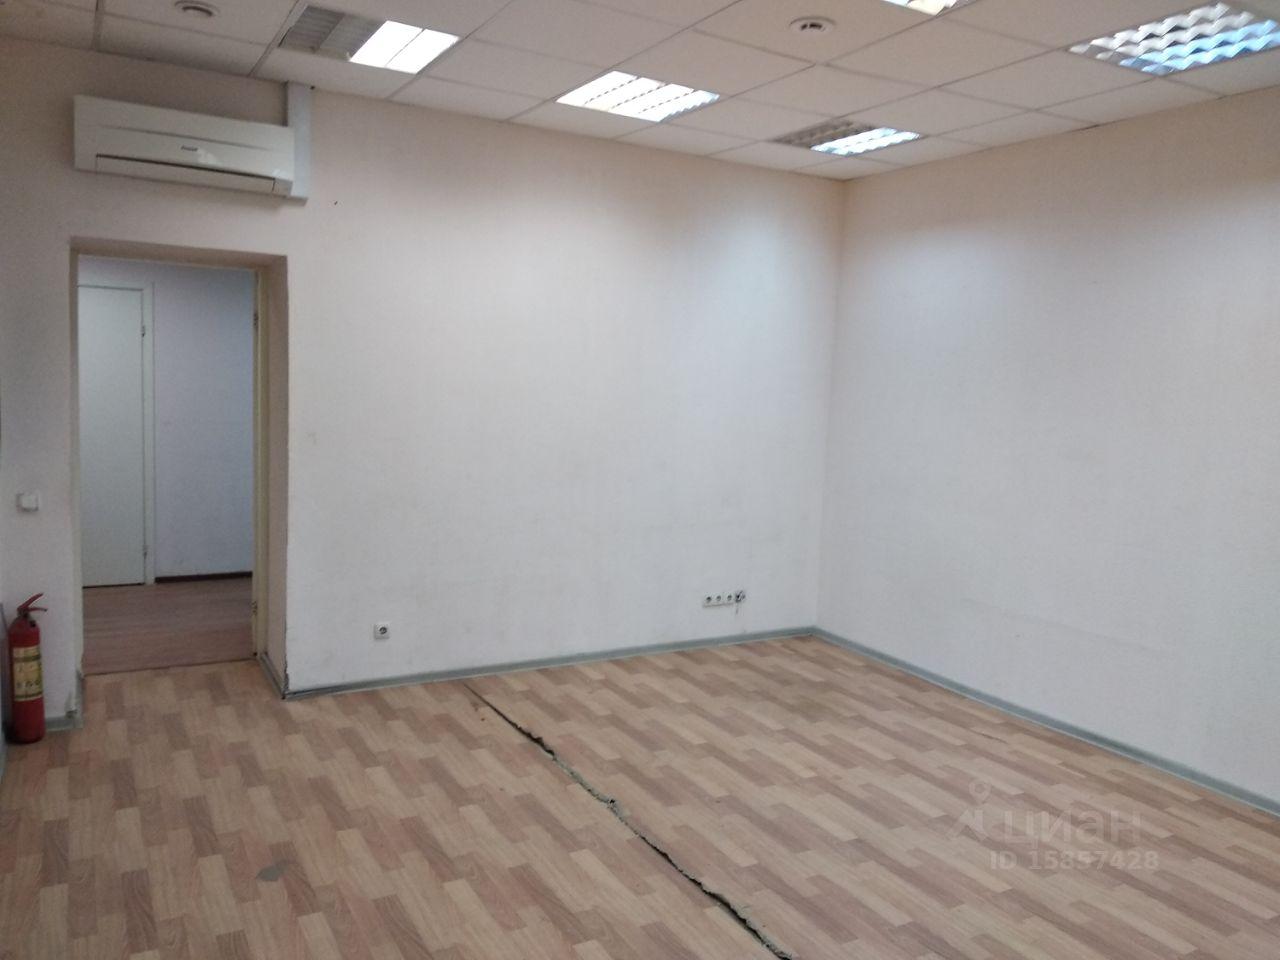 Марма аренда офиса сайт поиска помещений под офис Маршала Голованова улица